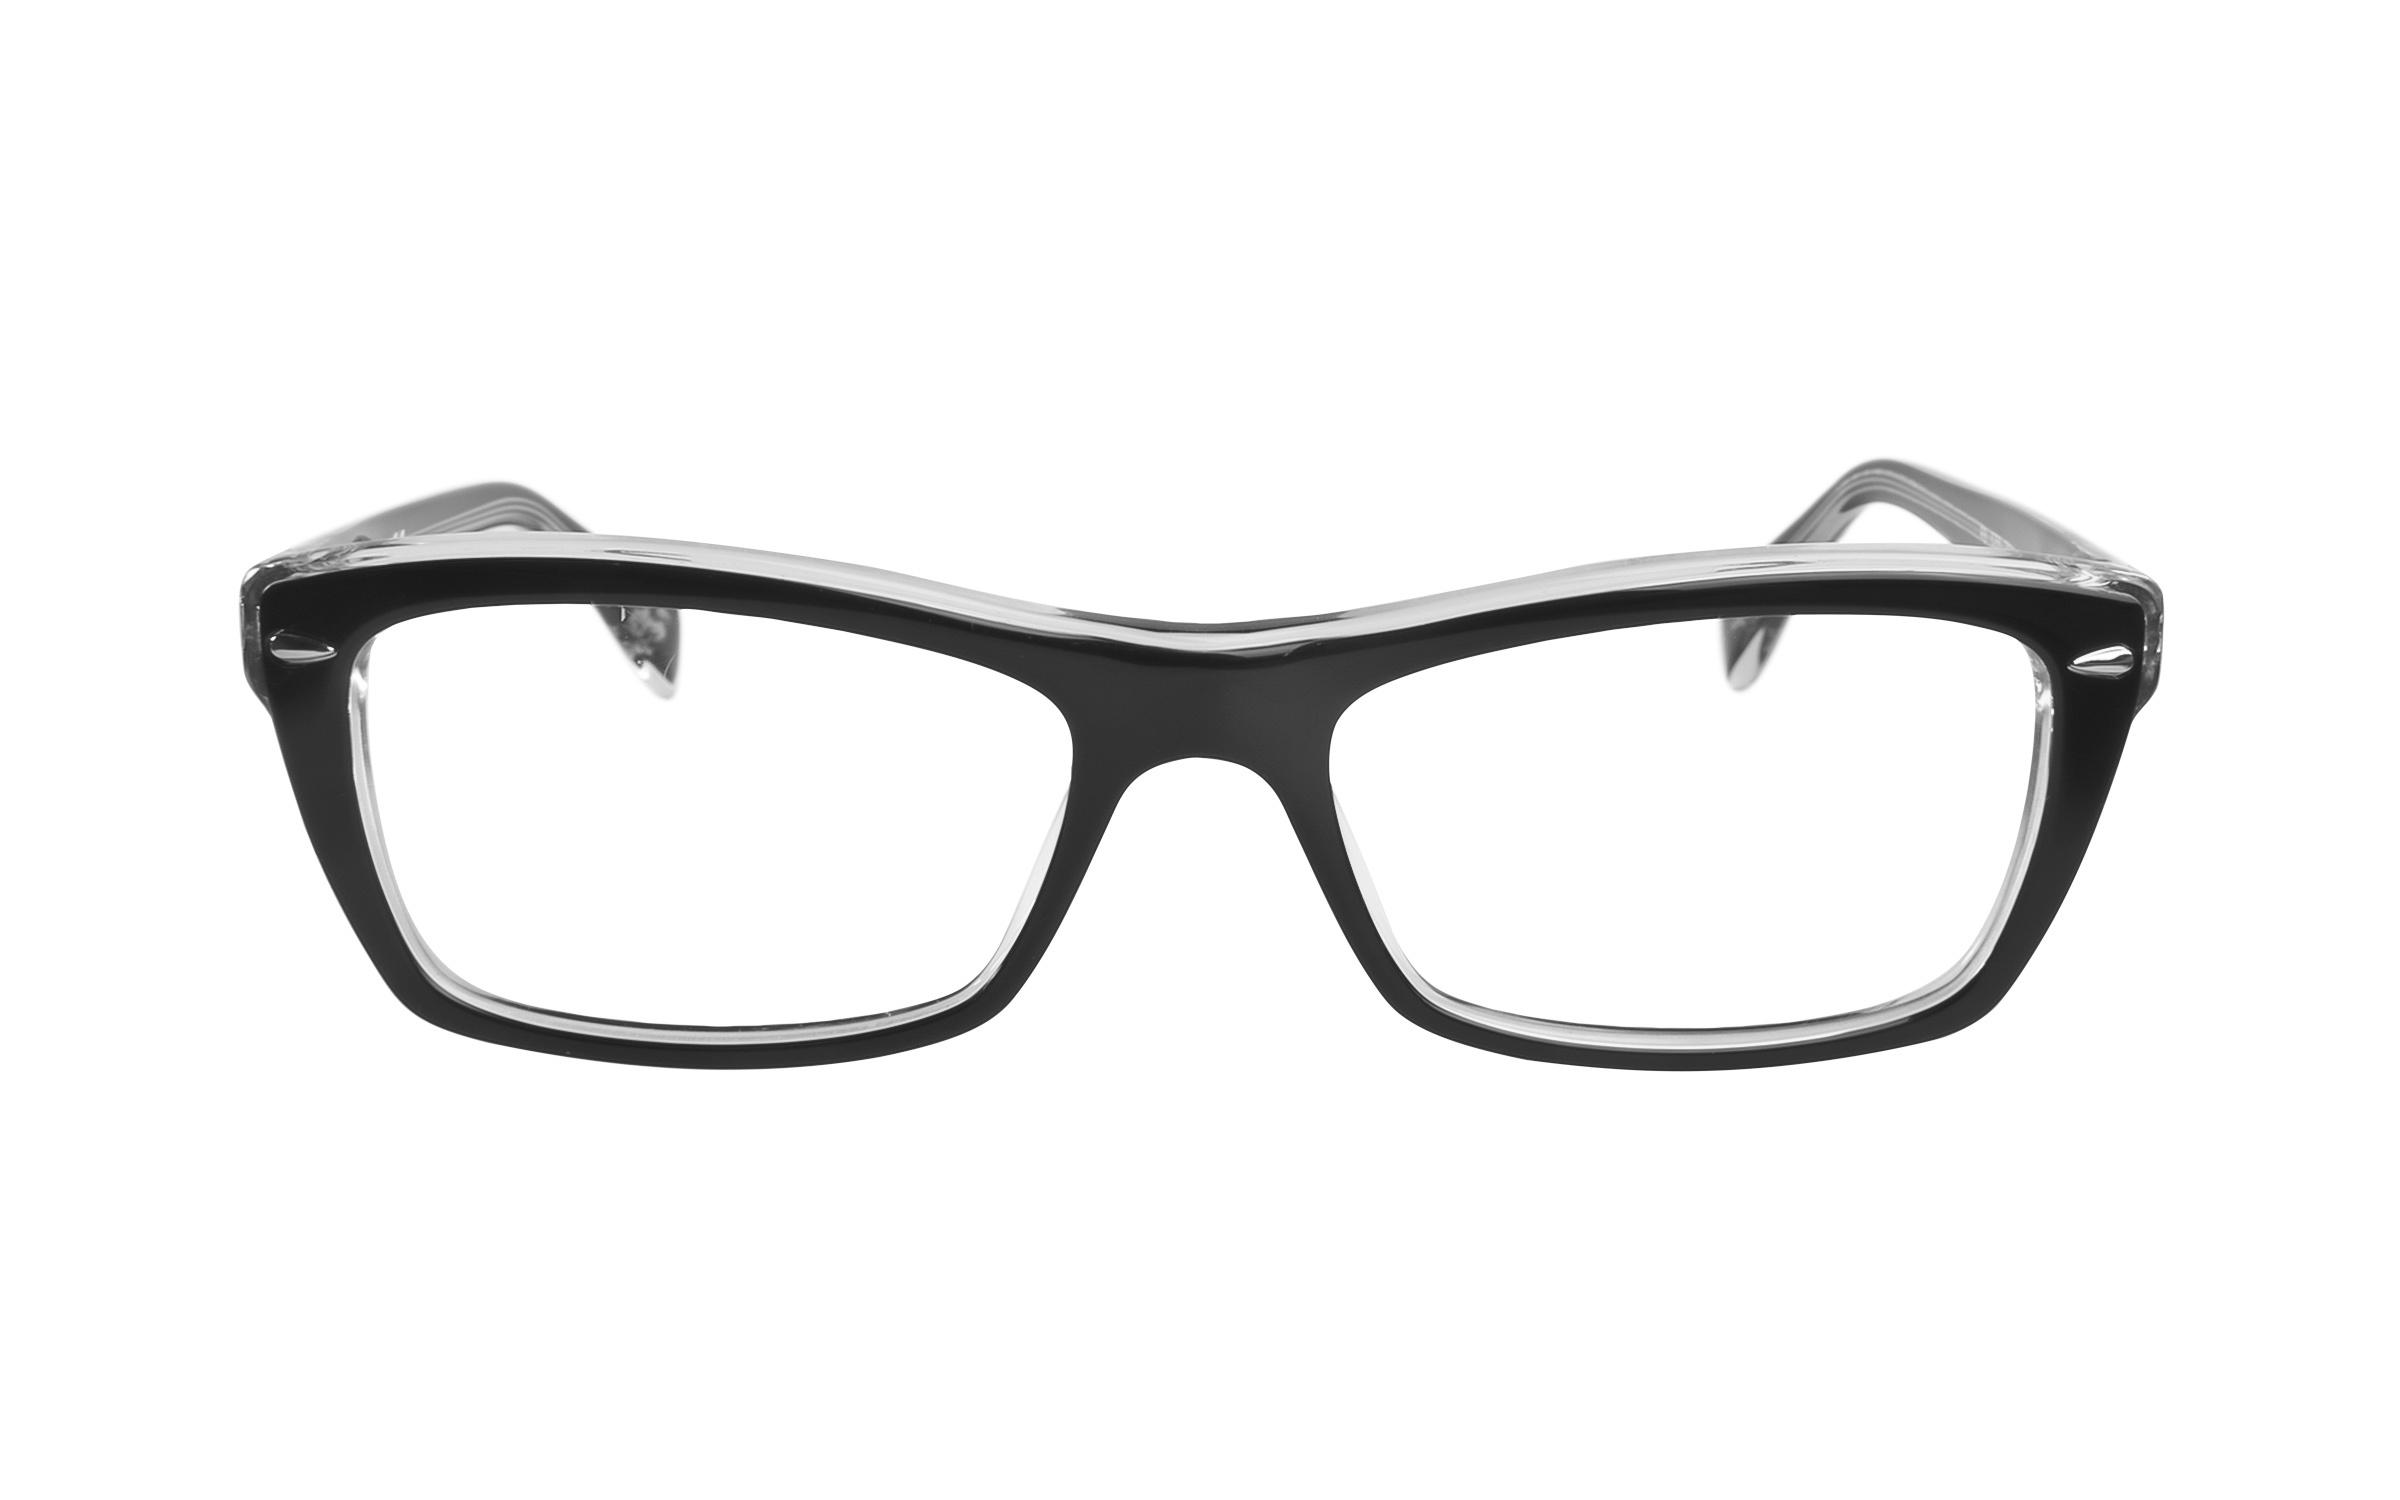 Ray-Ban RB5255 2034 Eyeglasses and Frame in Crystal Black/Clear | Acetate/Metal - Online Coastal